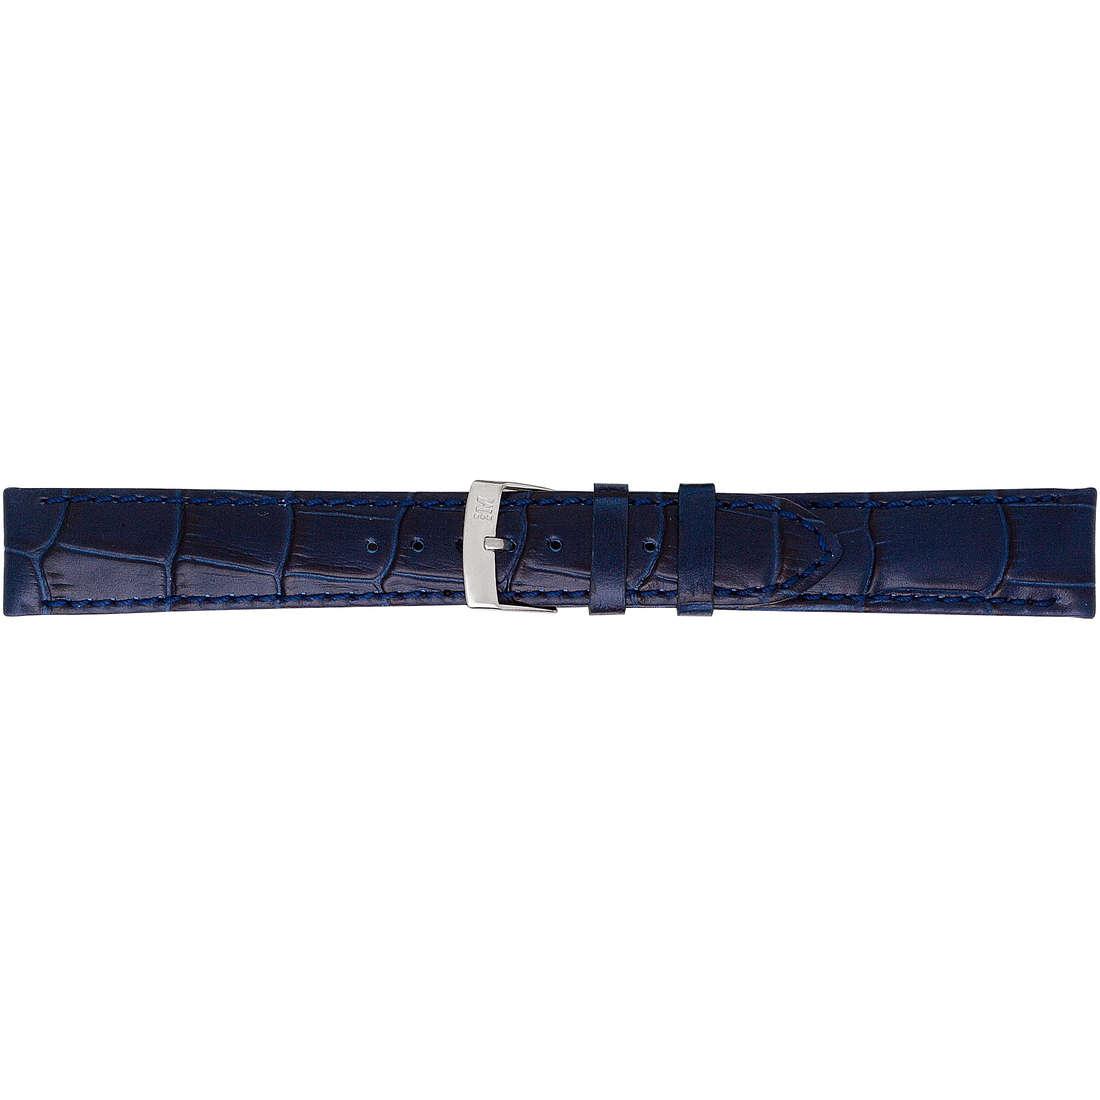 watch watch bands watch straps man Morellato Performance A01X2704656062CR22